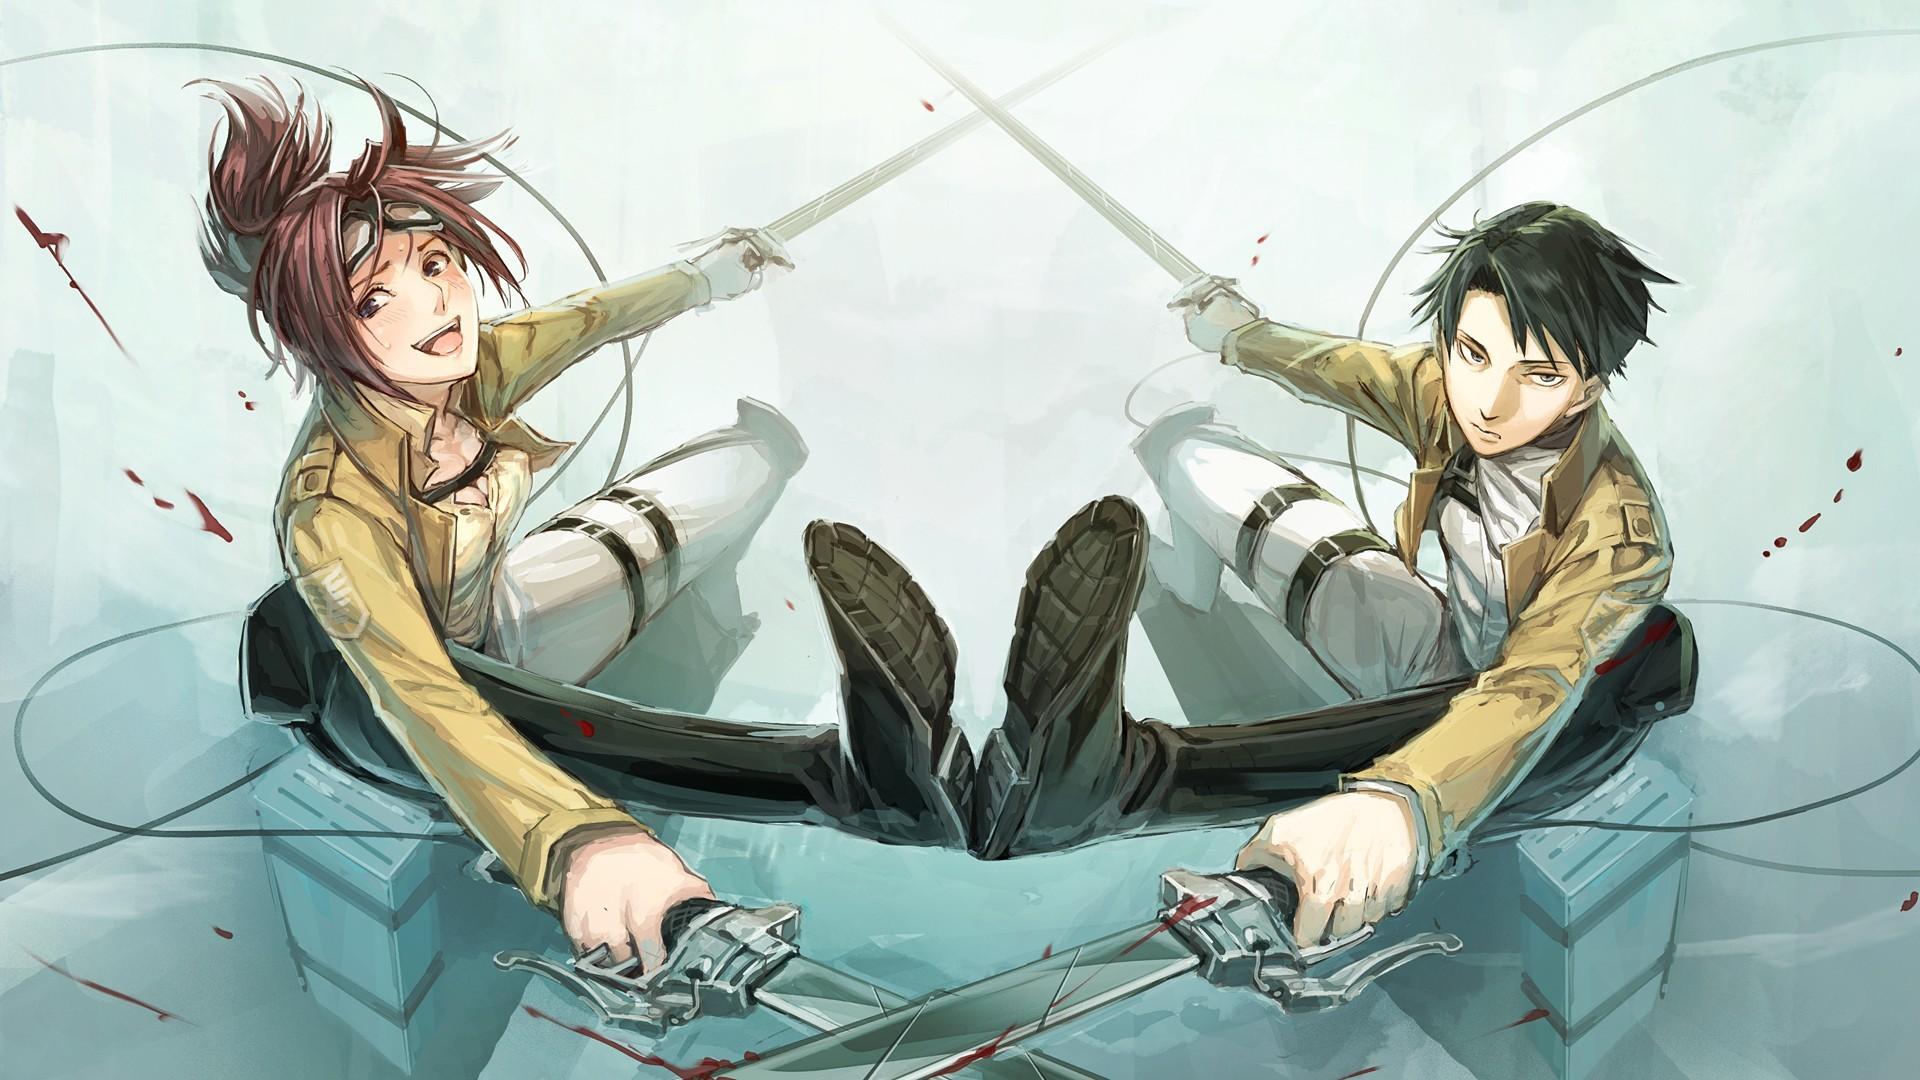 Anime – Attack On Titan Hange ZoÃ« Levi Ackerman Wallpaper